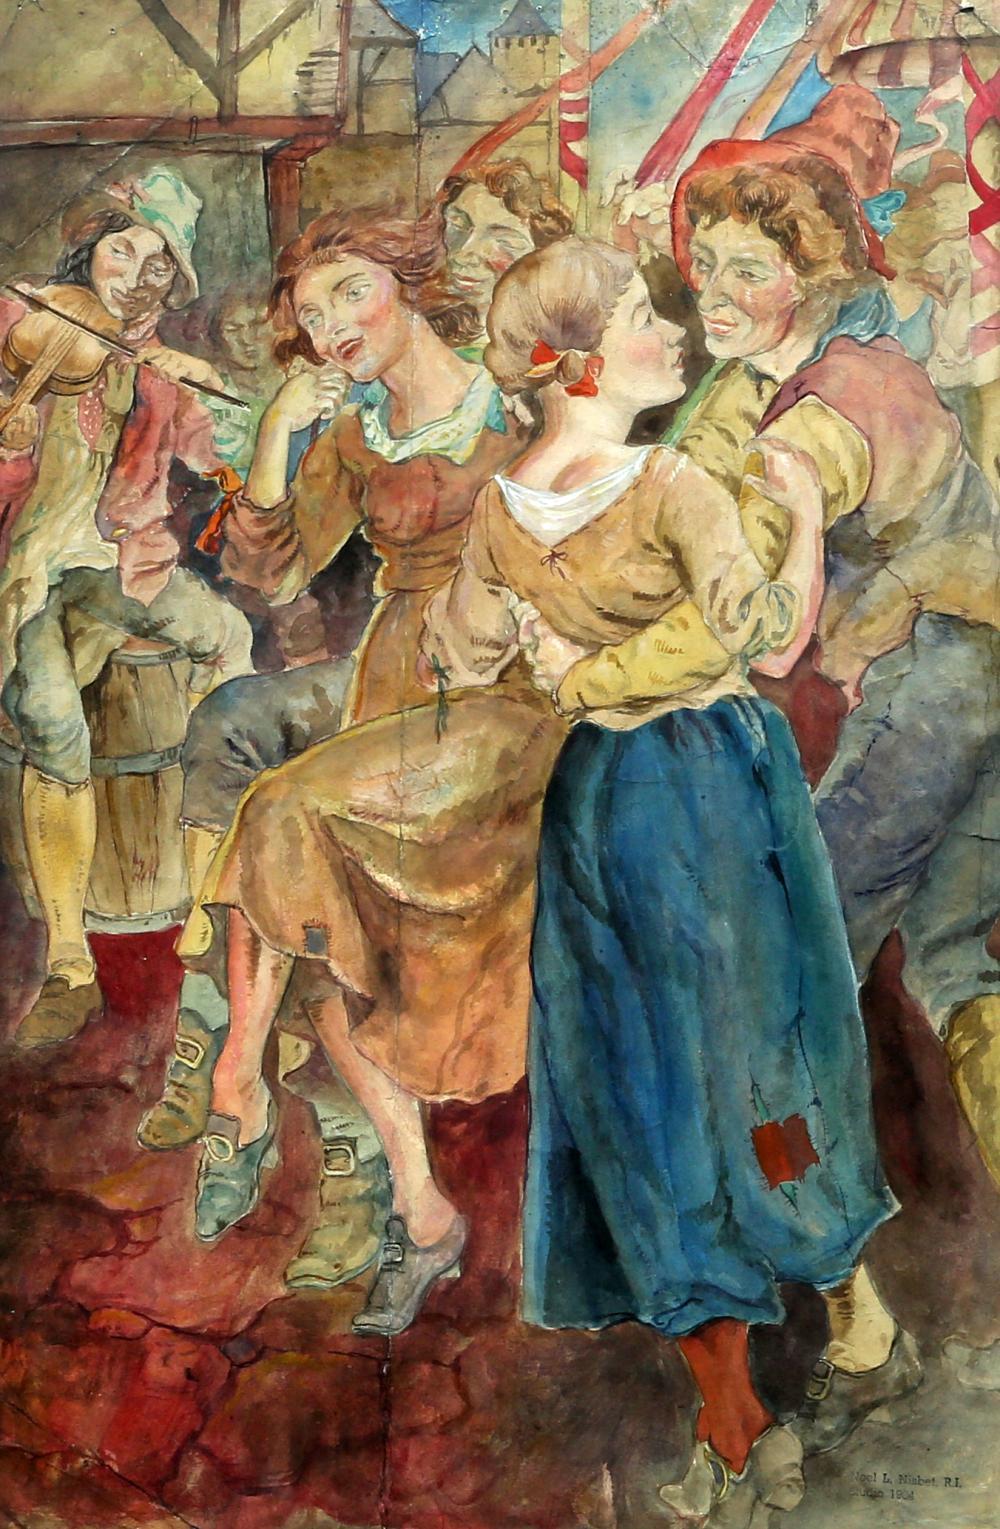 NOEL LAURA NISBET (BRITISH, 1887-1956), REVELLERS AT A COUNTRY FAIR,artist